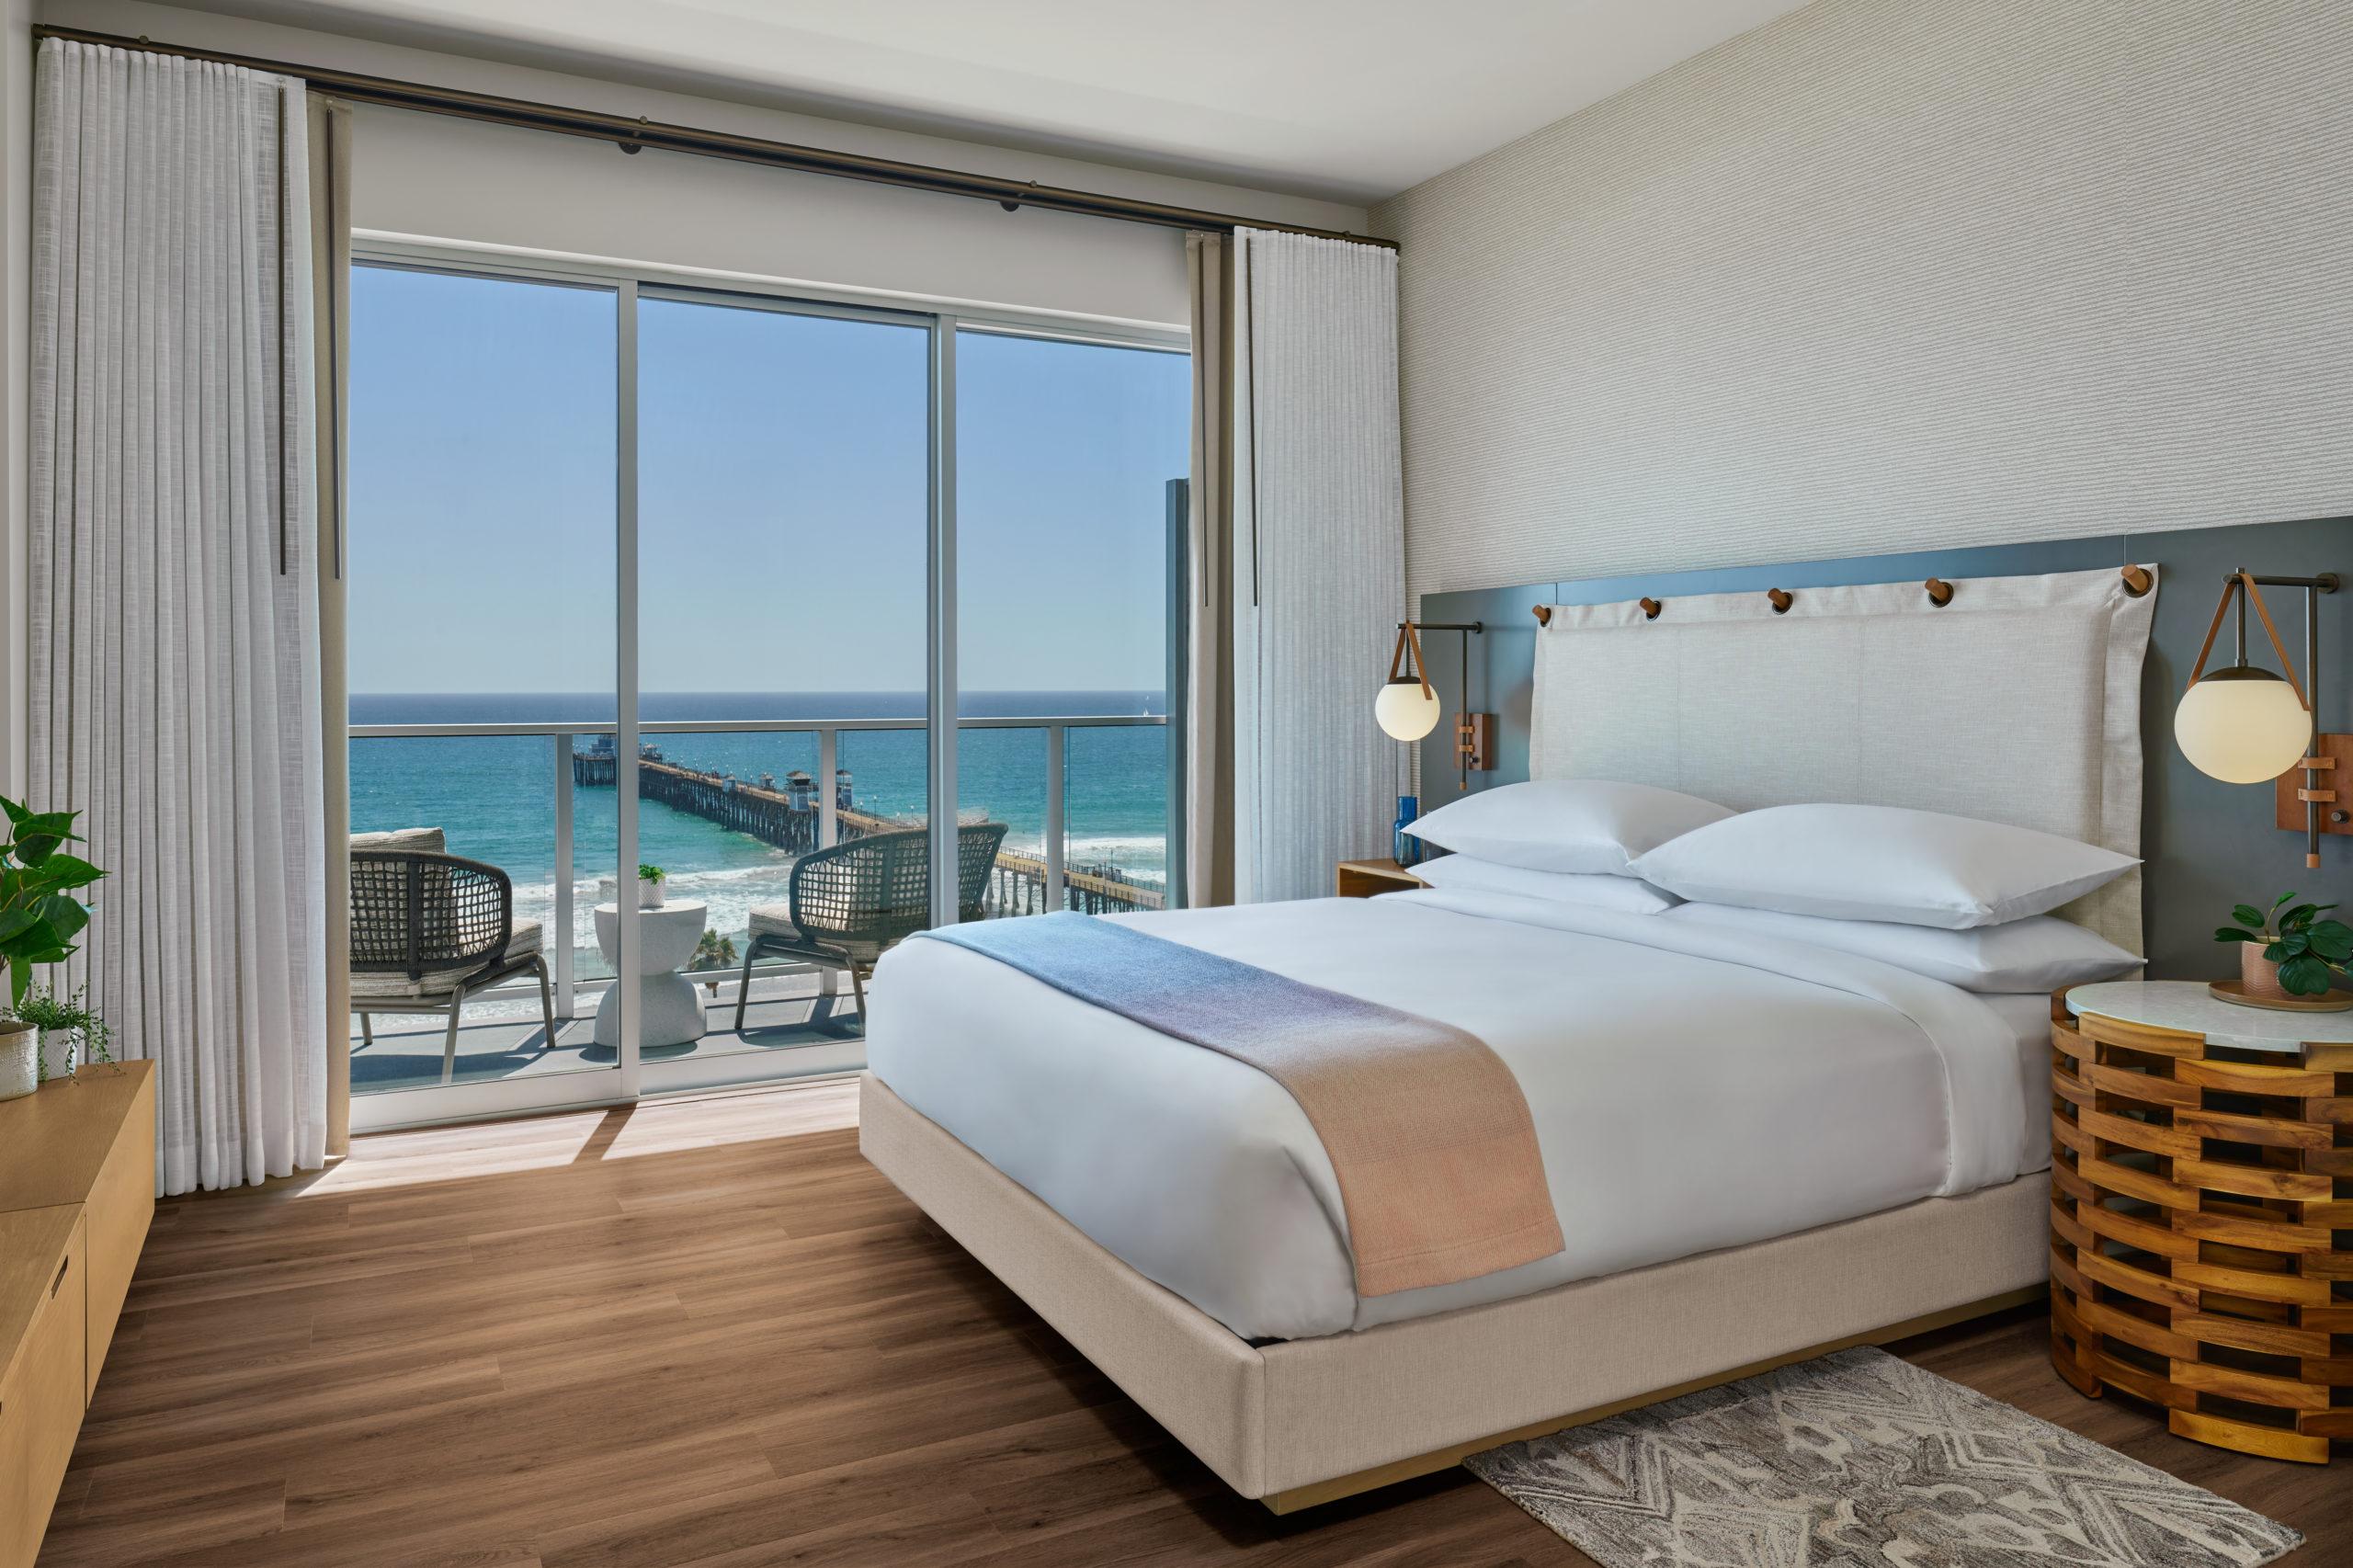 king room with ocean views